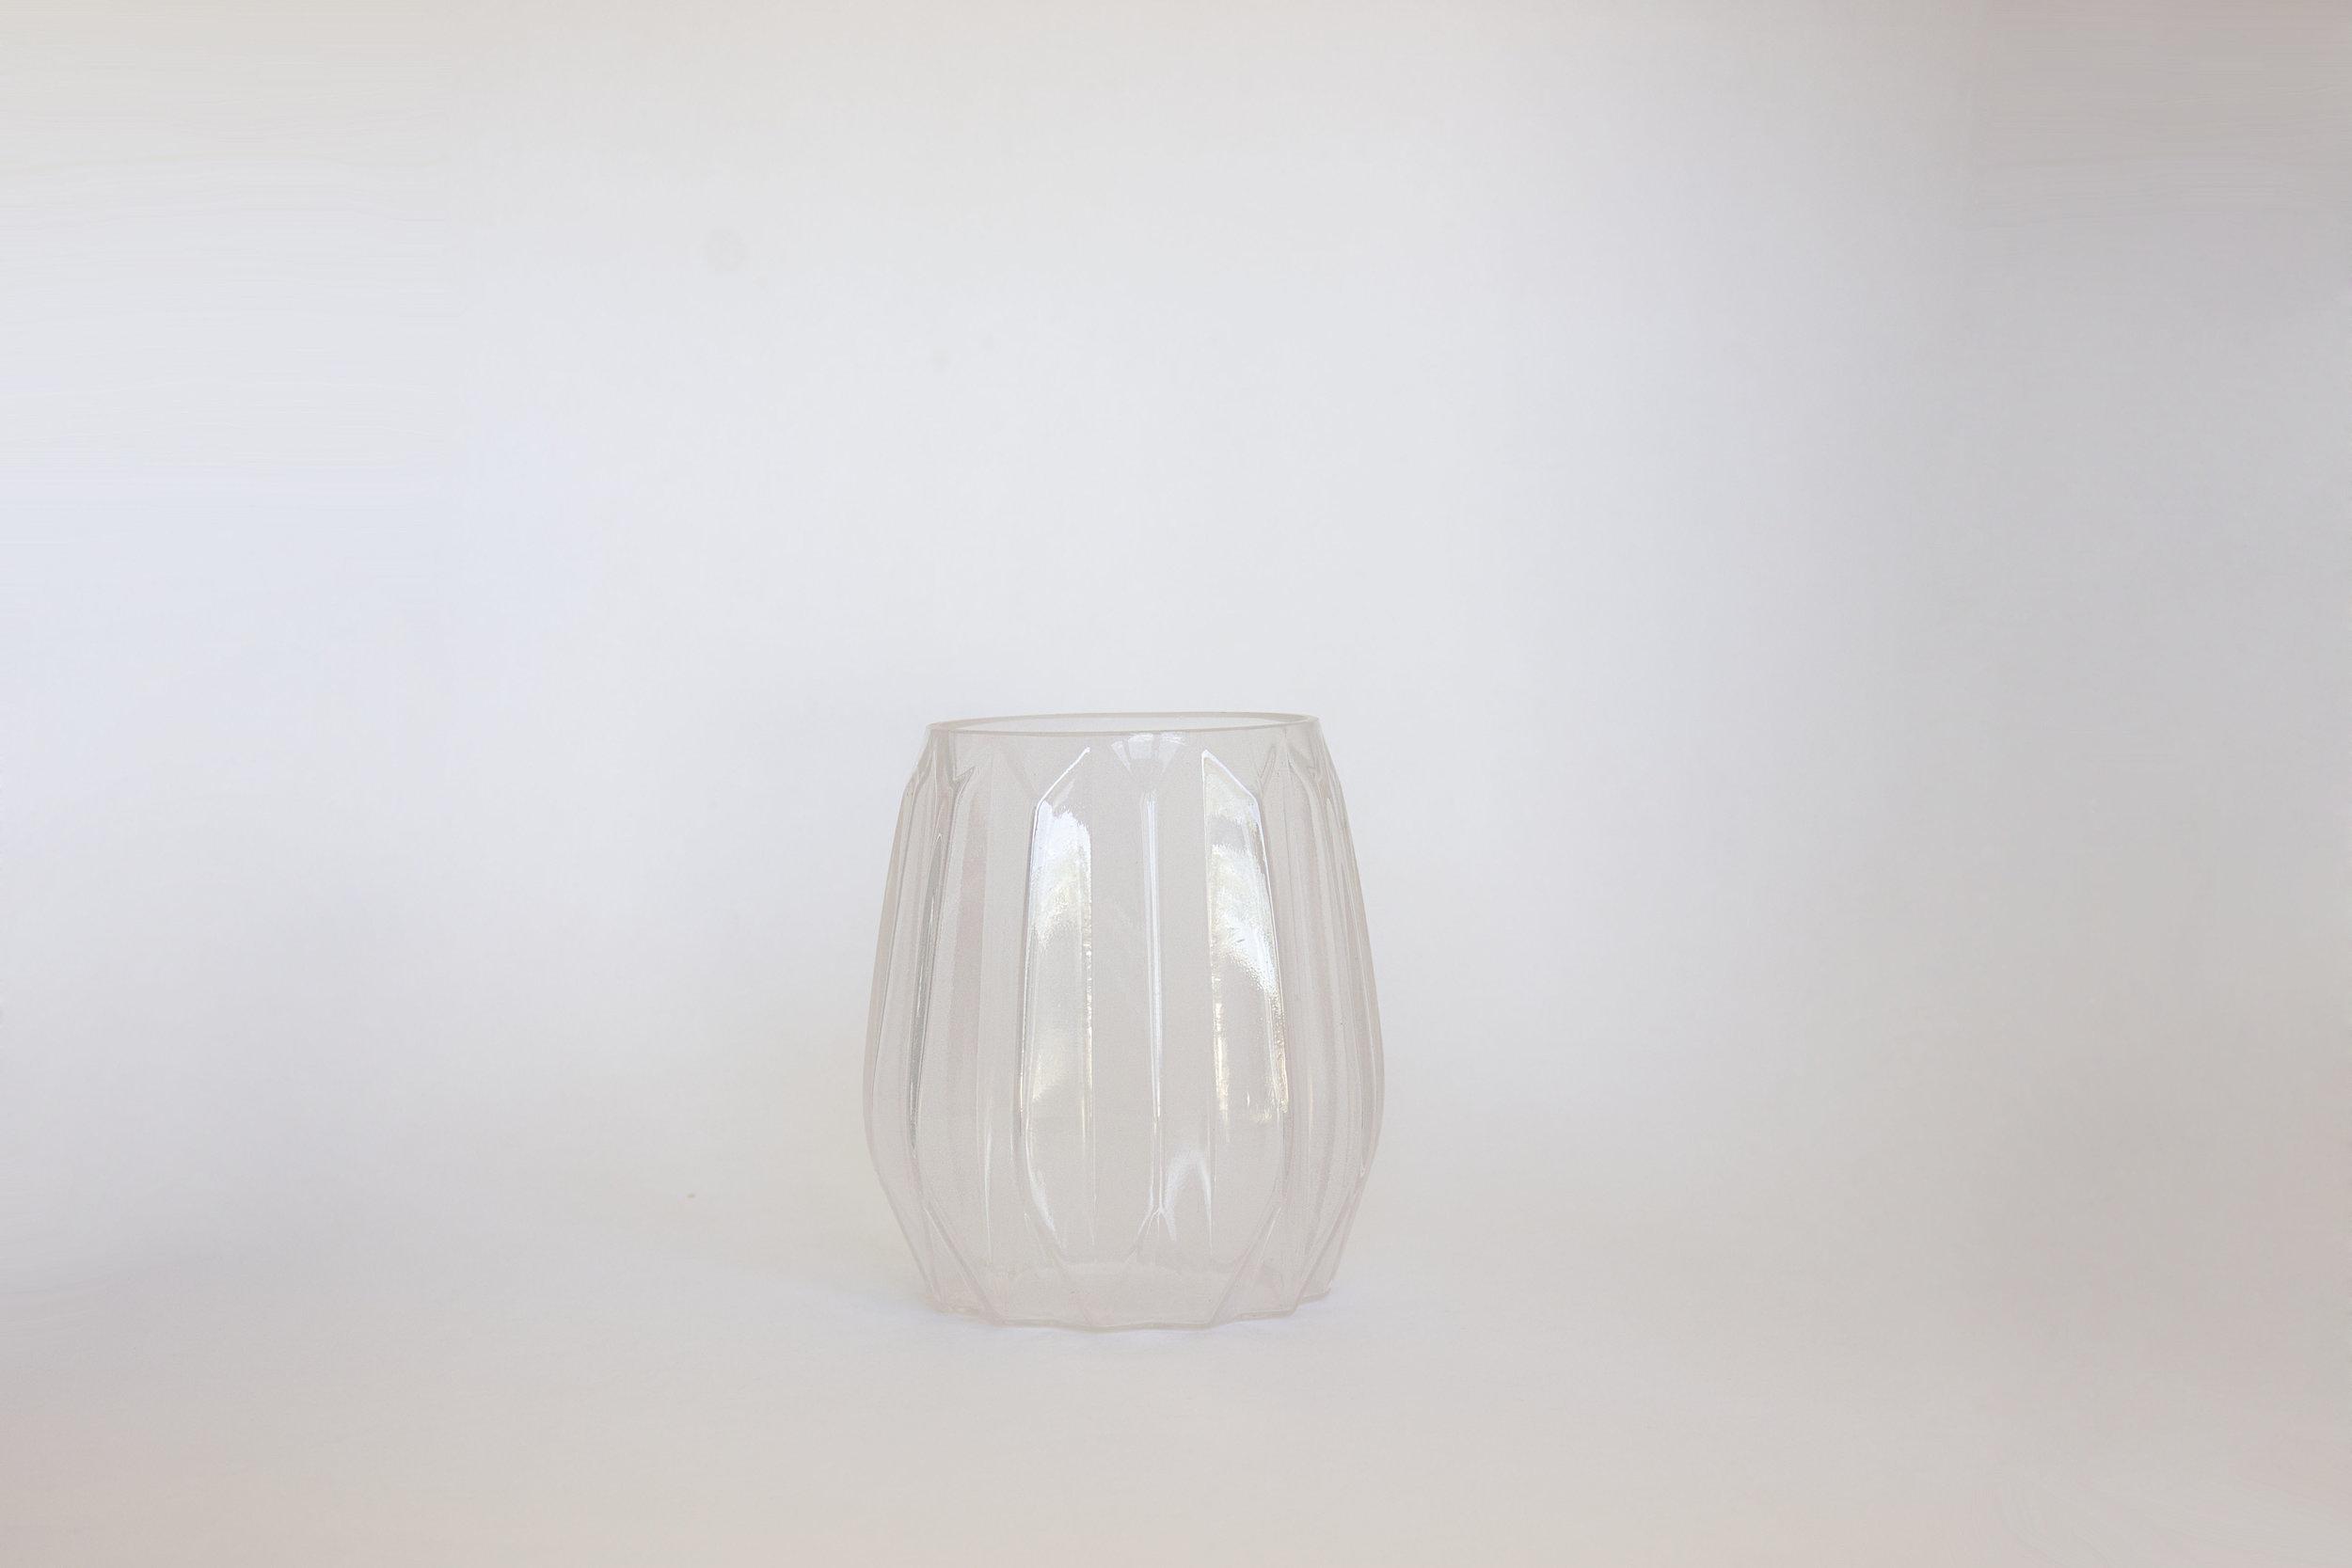 PINK FACETED GLASS VASE